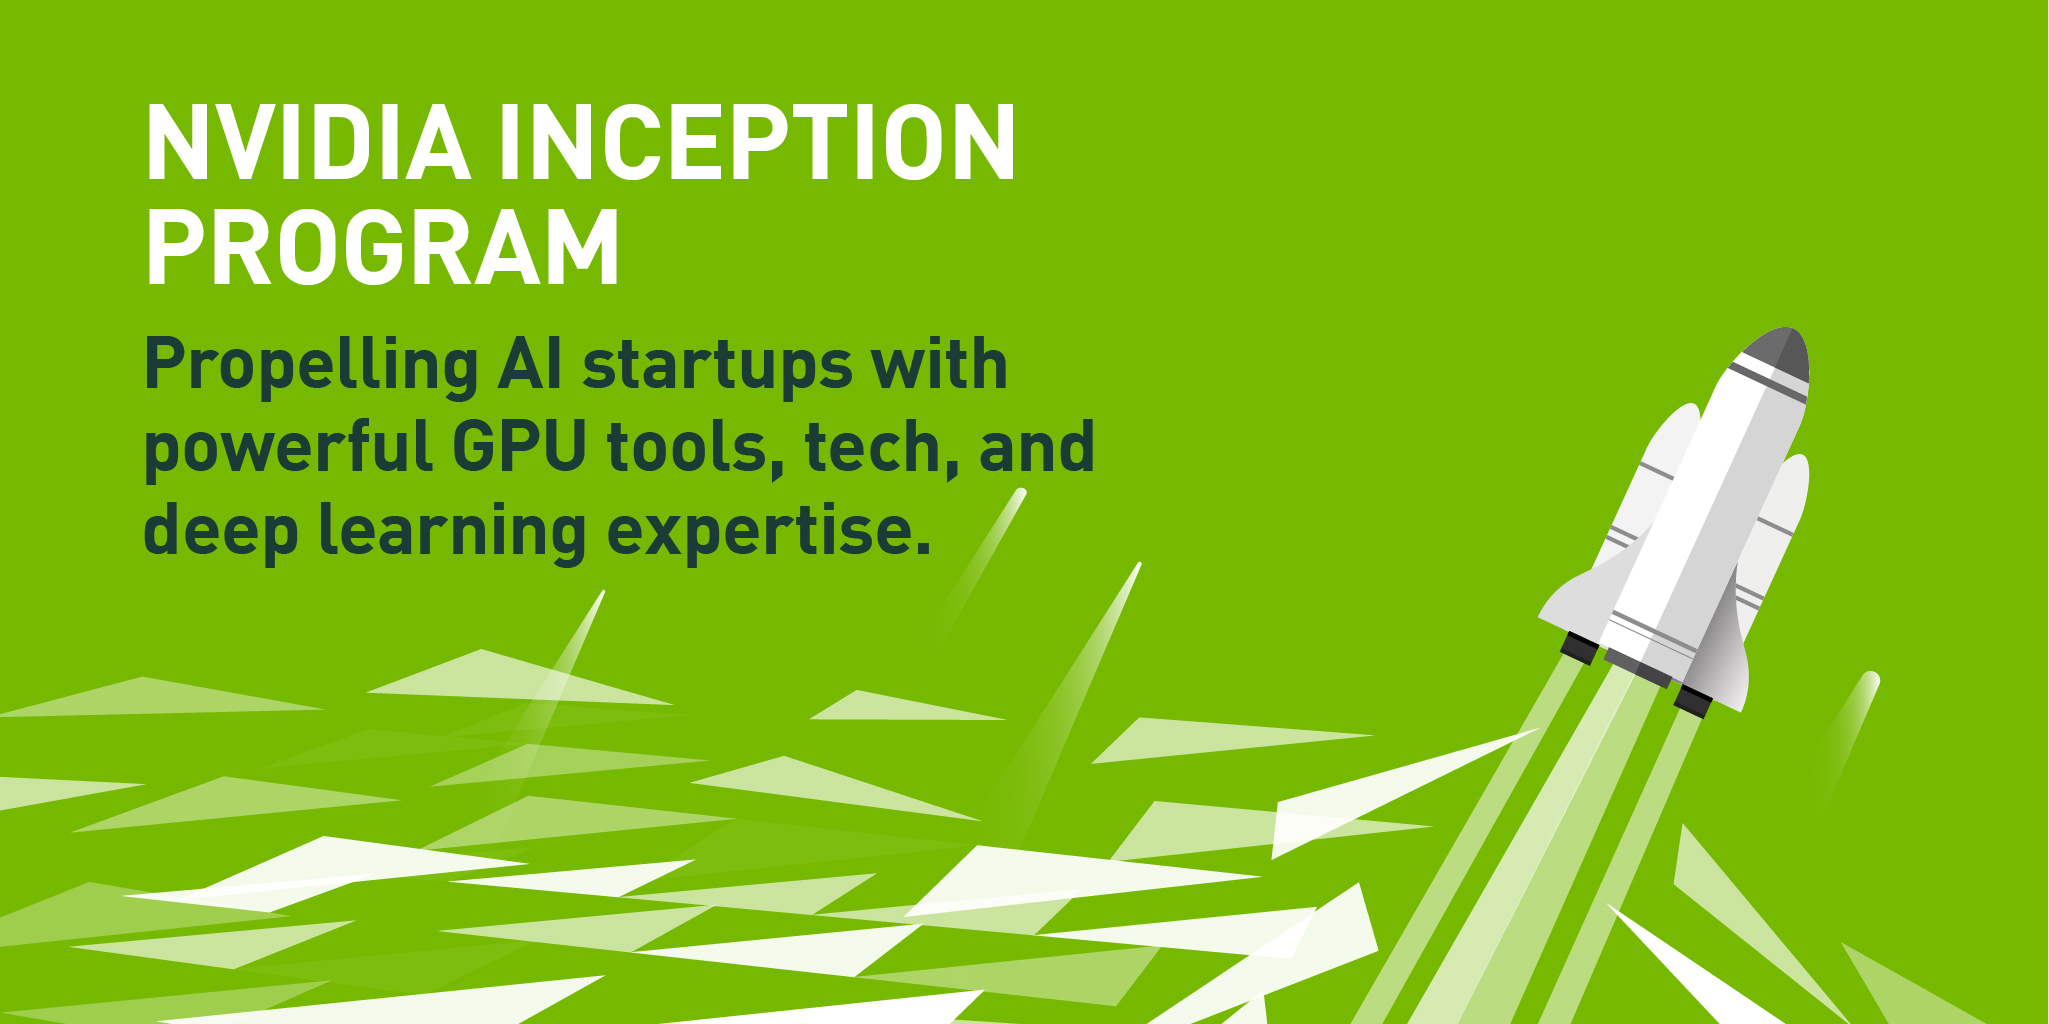 Aceleron Joins NVIDIA Inception Program